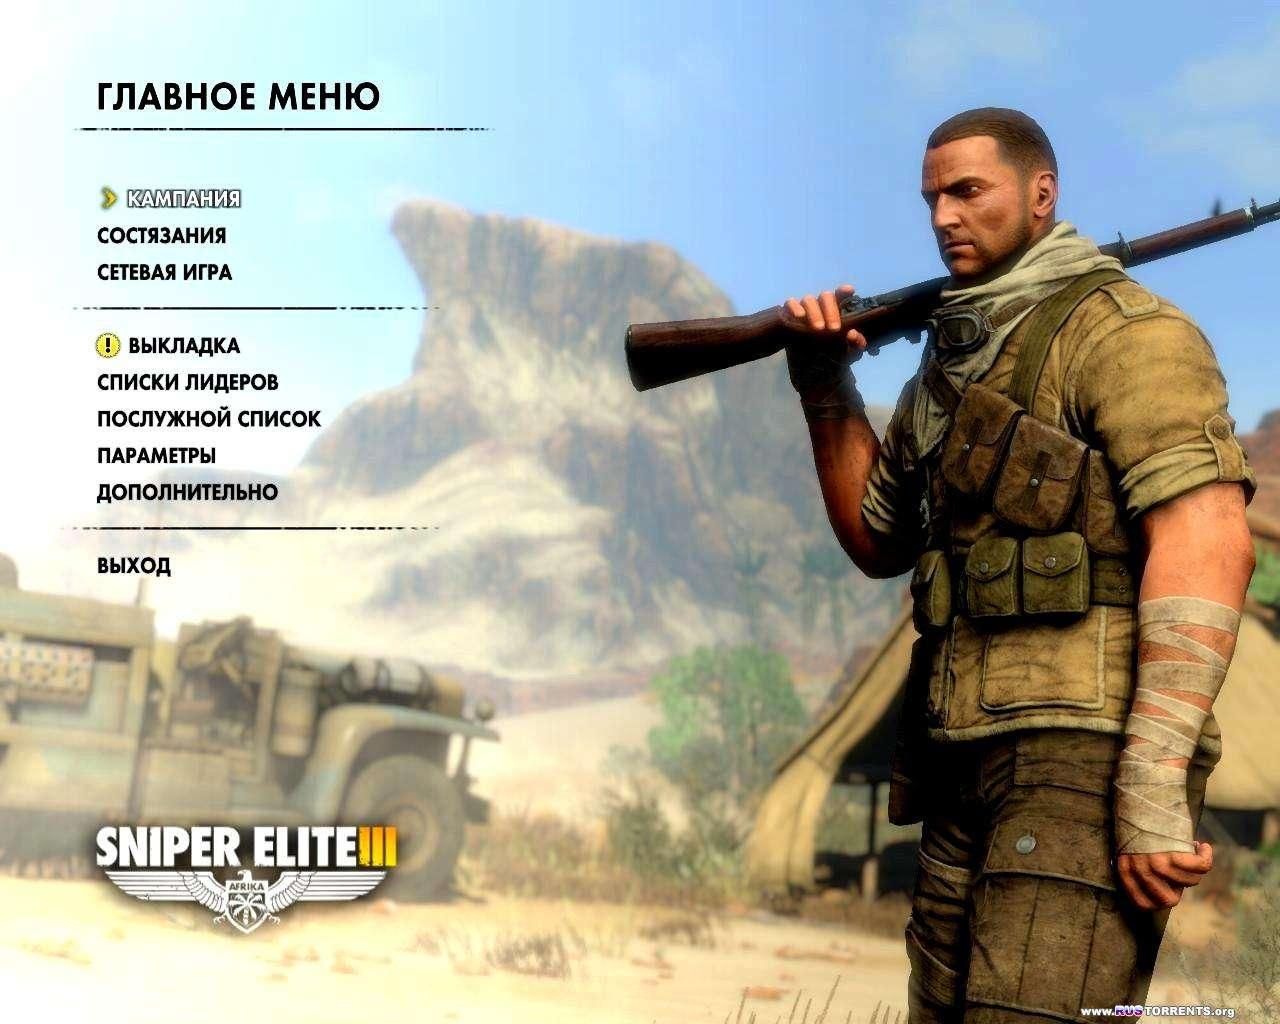 Sniper Elite III [v. 1.10 + 12 DLC] | PC | Rip от R.G. Freedom